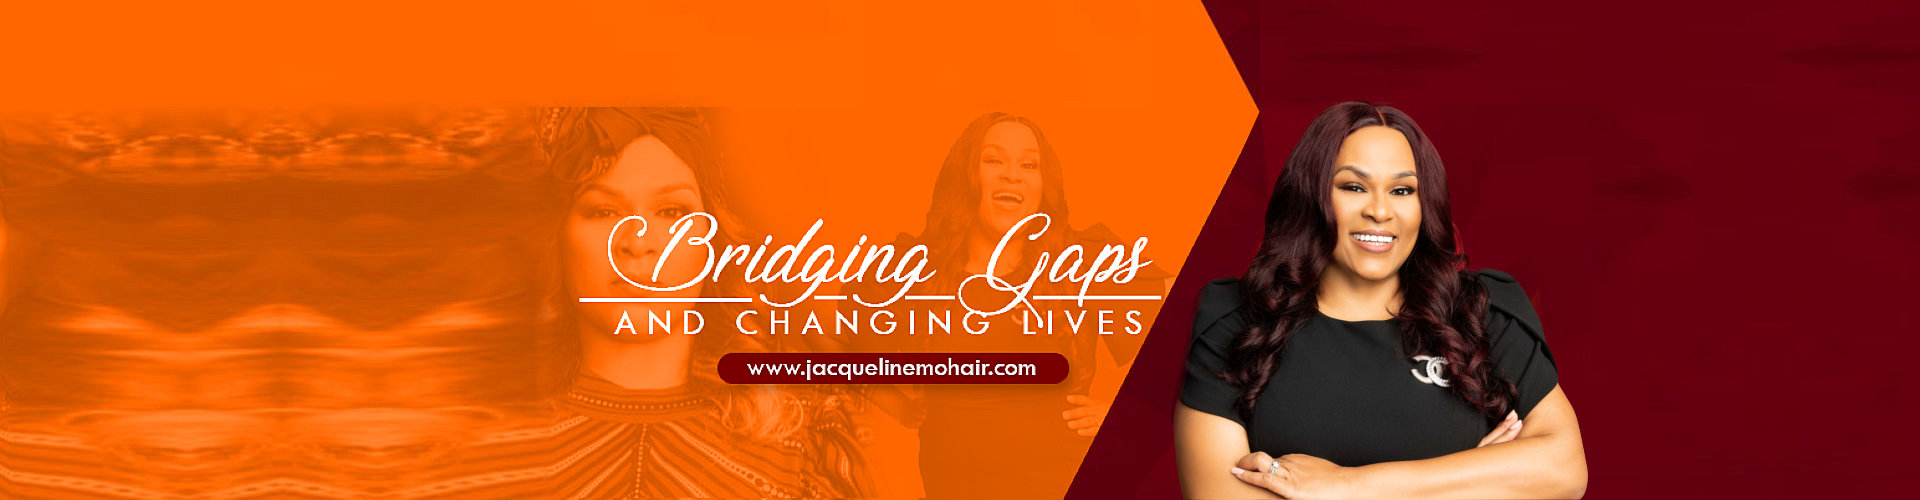 bridging gaps and changing live